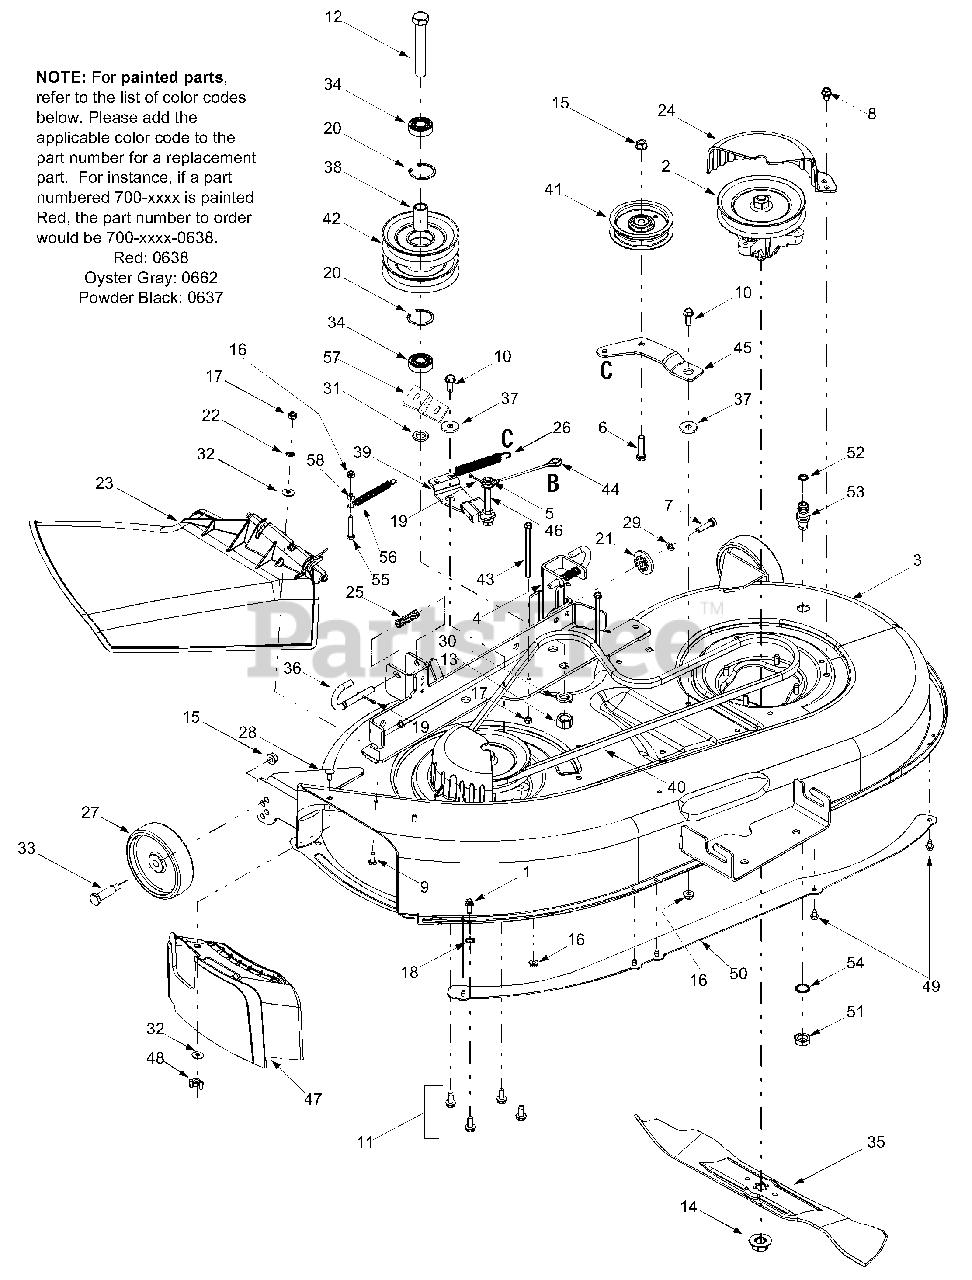 Troy Bilt Bronco Deck Belt Diagram : bronco, diagram, Troy-Bilt, 13AJ609G766, Bronco, Tractor, (2004), Assembly, Parts, Lookup, Diagrams, PartsTree